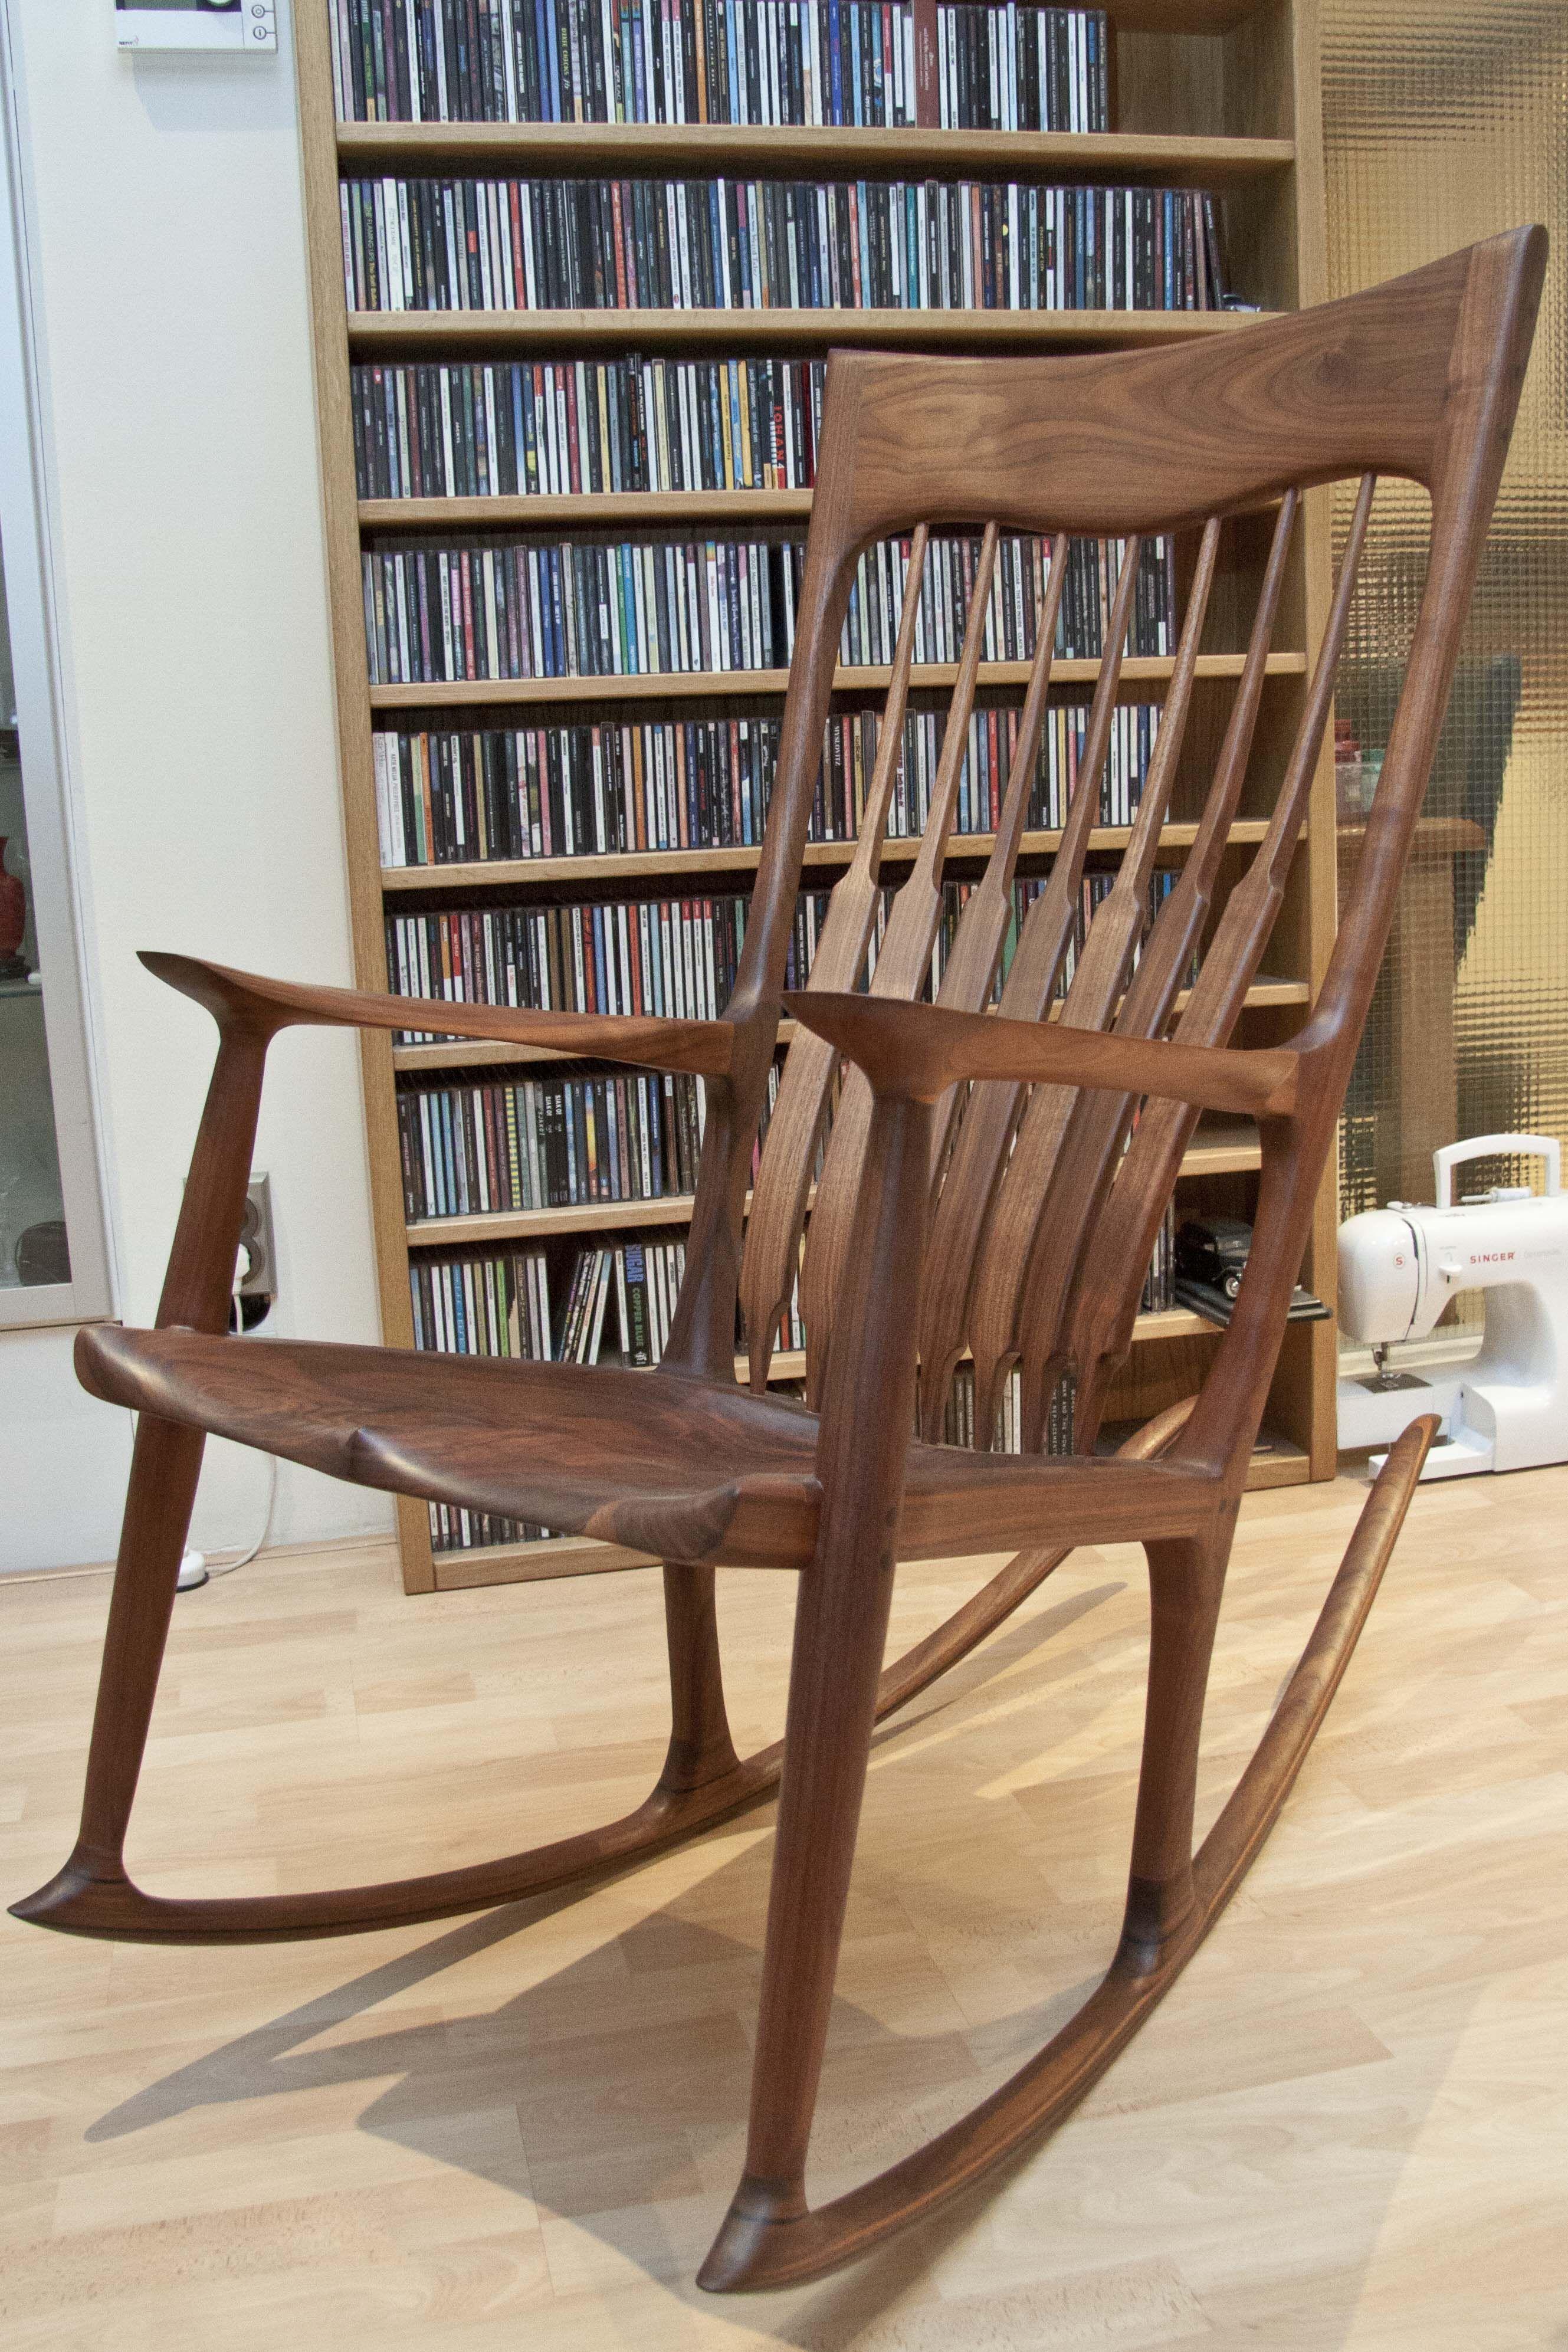 maloof inspired rocking chair walnut rockers chairs stools rh pinterest com